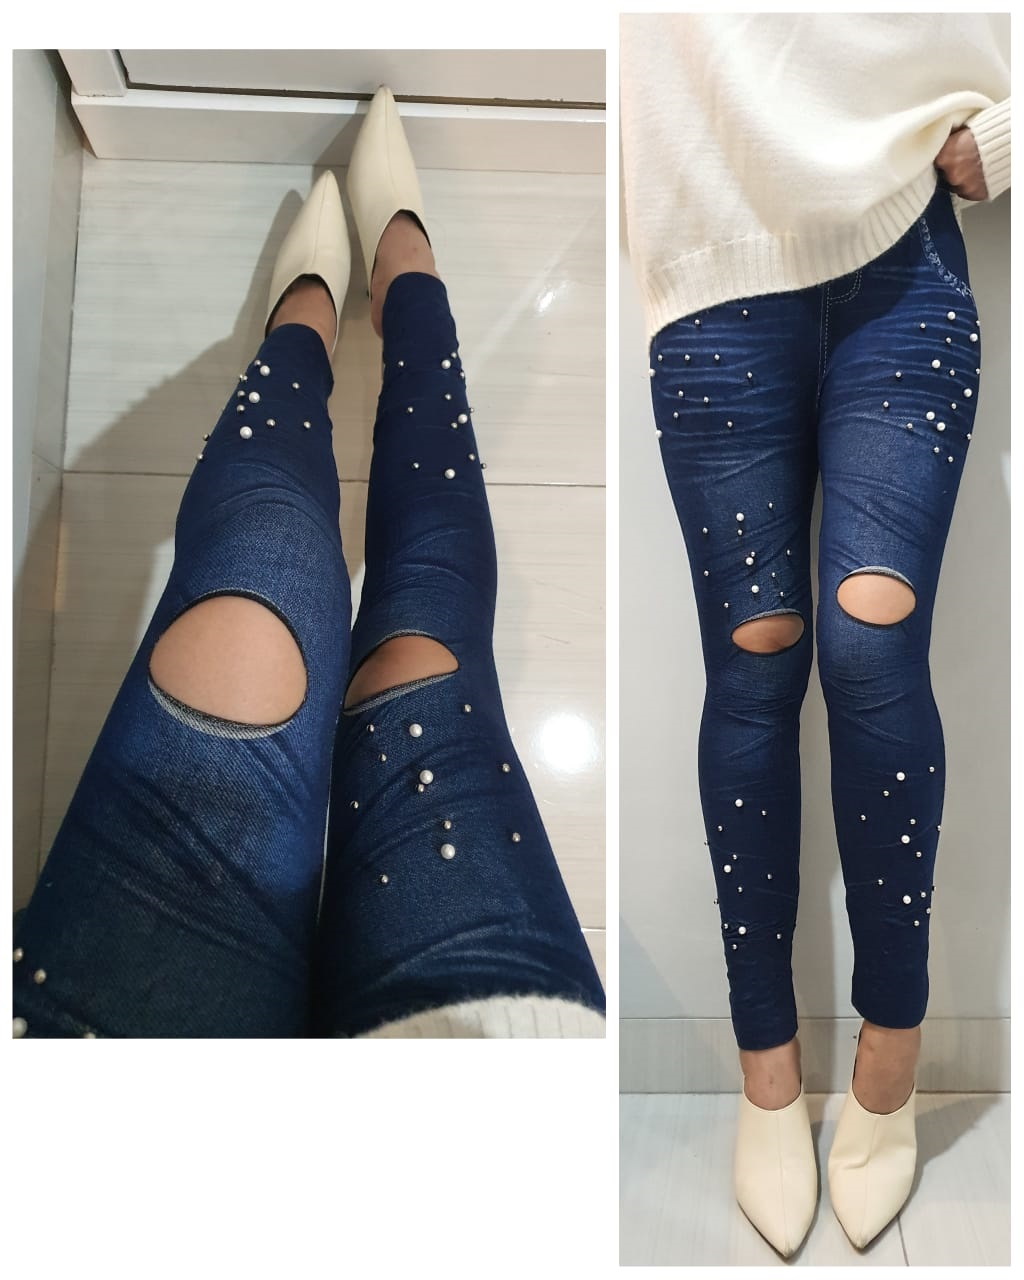 Sistaque Celana Legging Wanita Motif Jeans Sobek Lutut Variasi Mote Mutiara Modiffa Lazada Indonesia